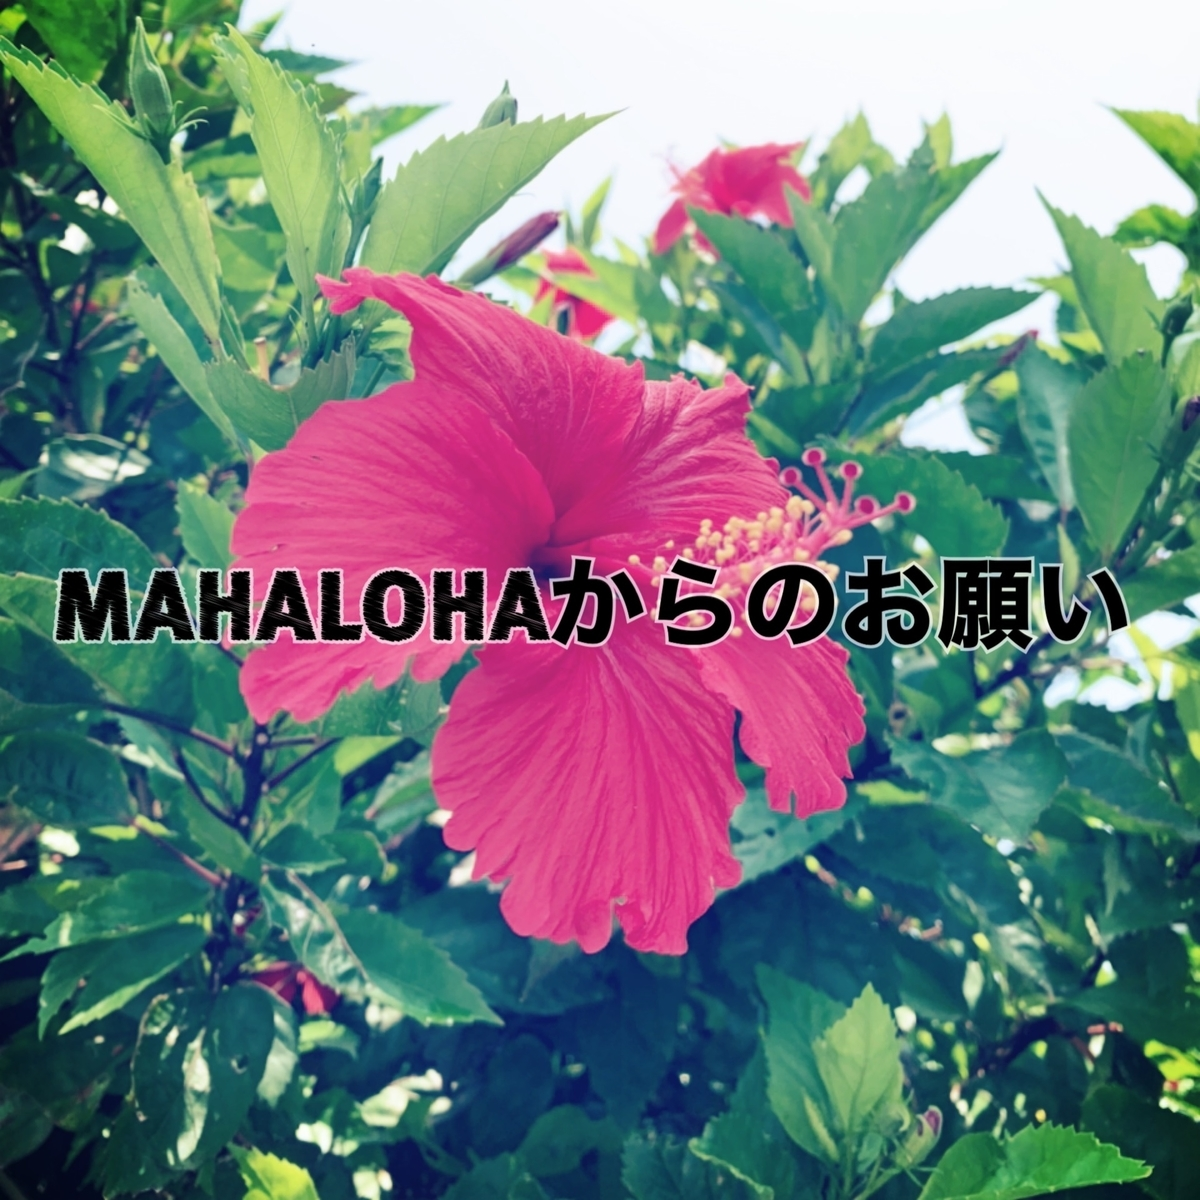 f:id:mahalohaokinawa:20200808154256j:plain